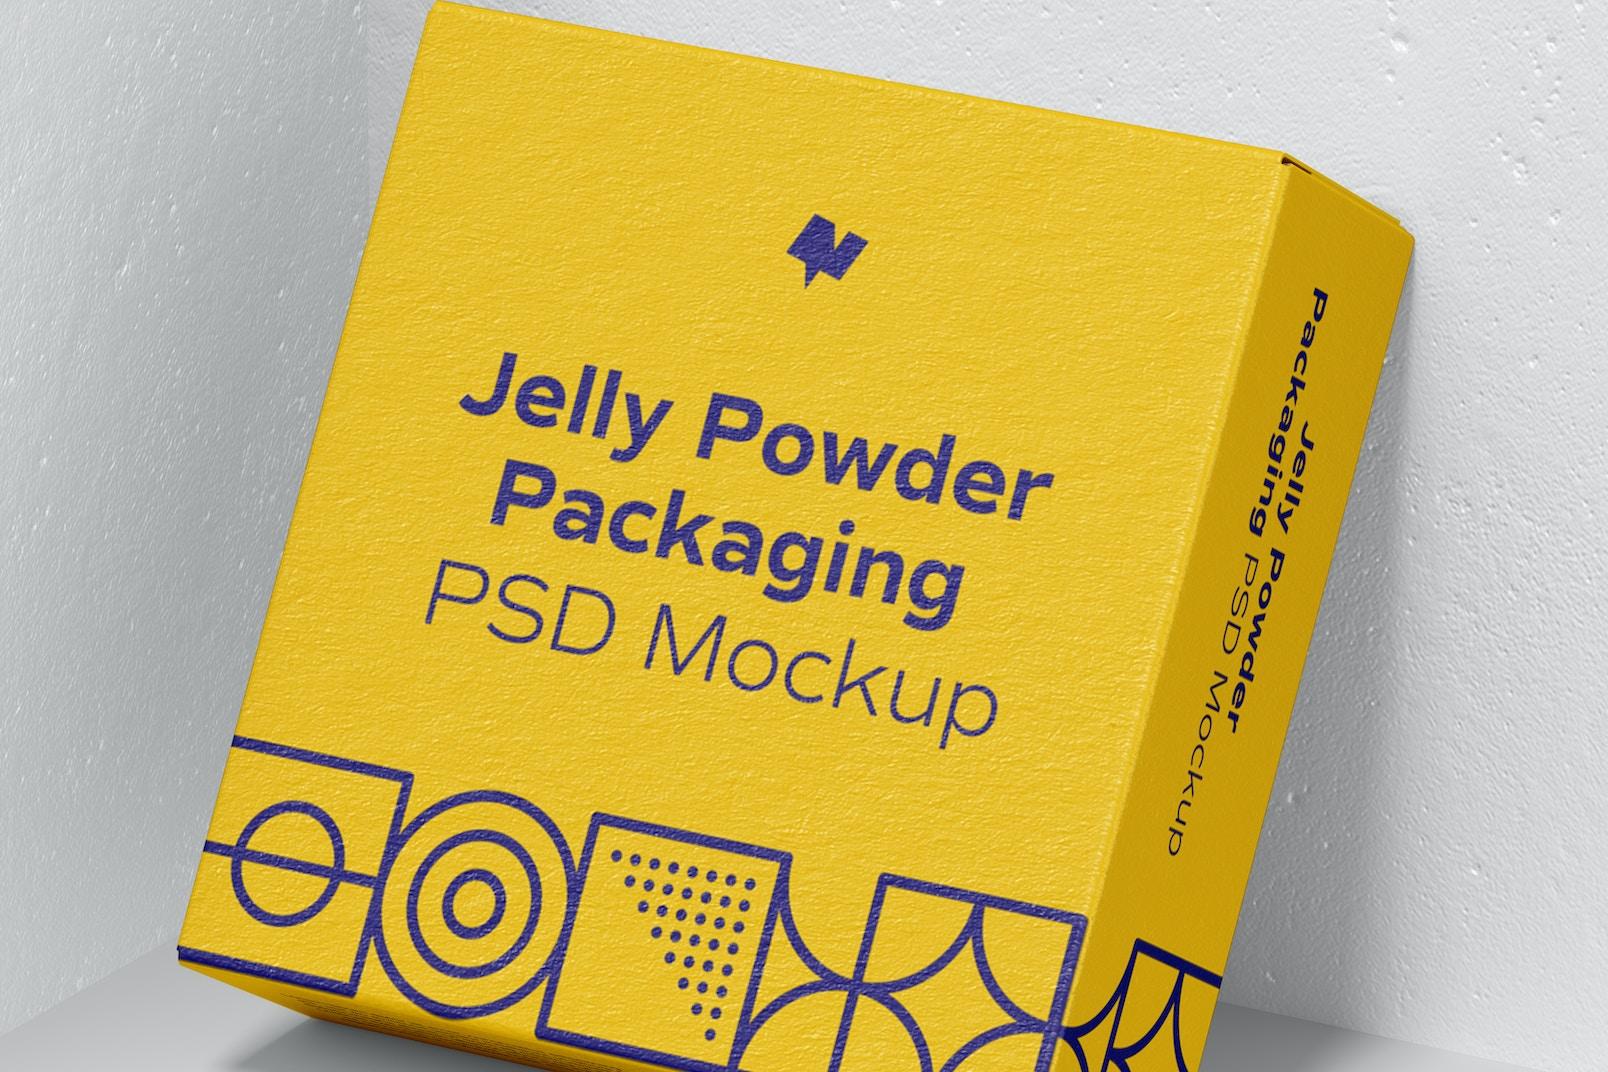 Jelly Powder Packaging Mockup, Leaned